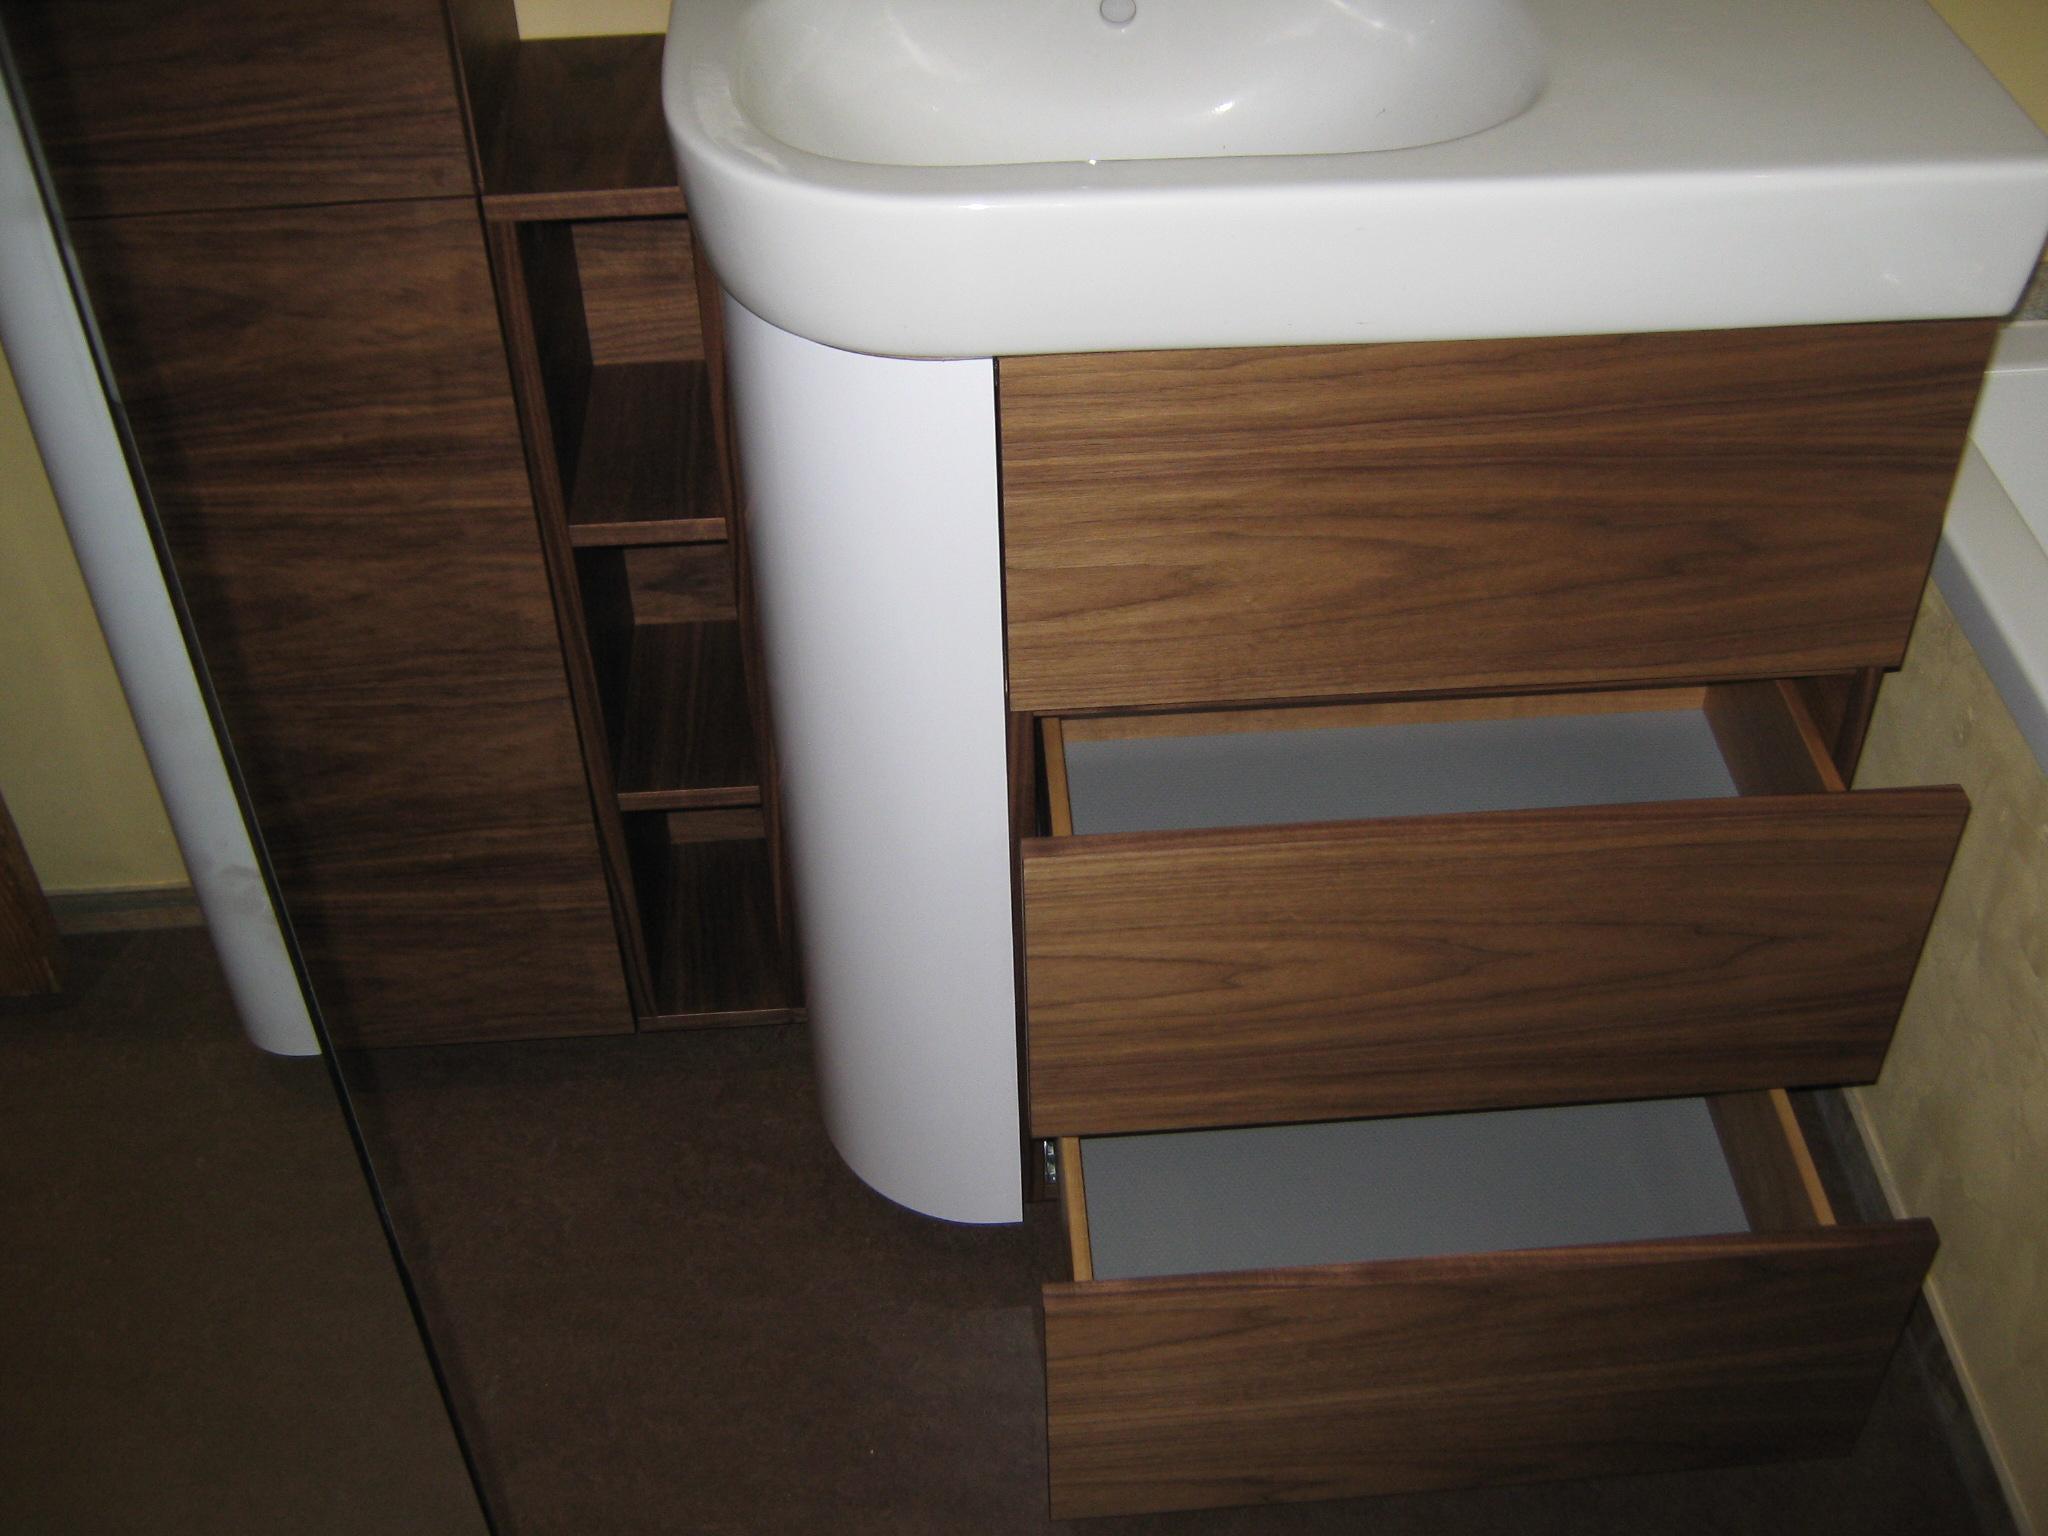 Beton cire badkamer wit: betonlook tegels badkamer tg wonen ...